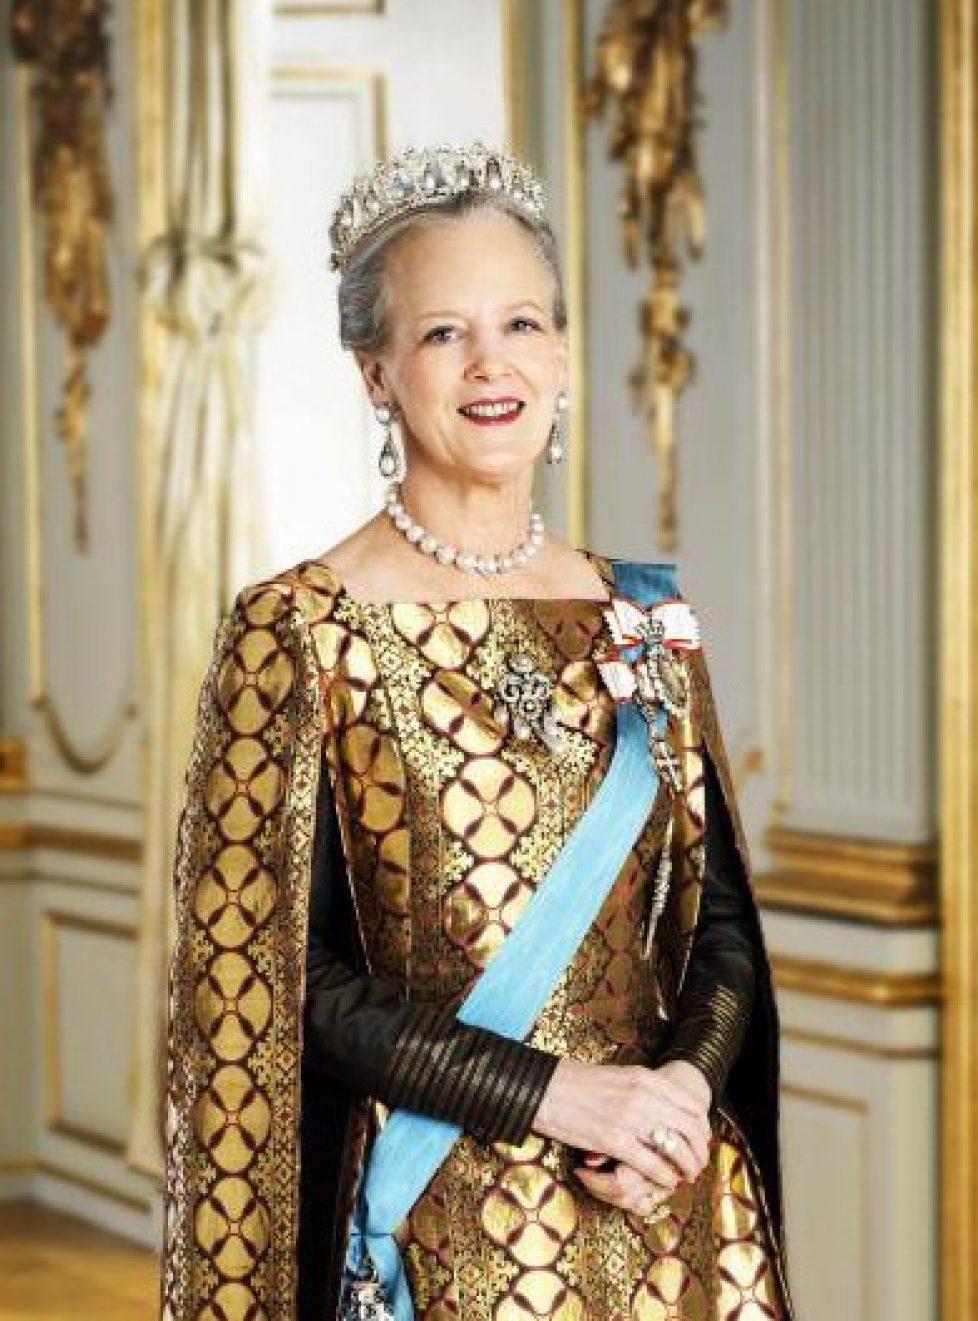 Queen_Margrethe_II_of_Denmark_small